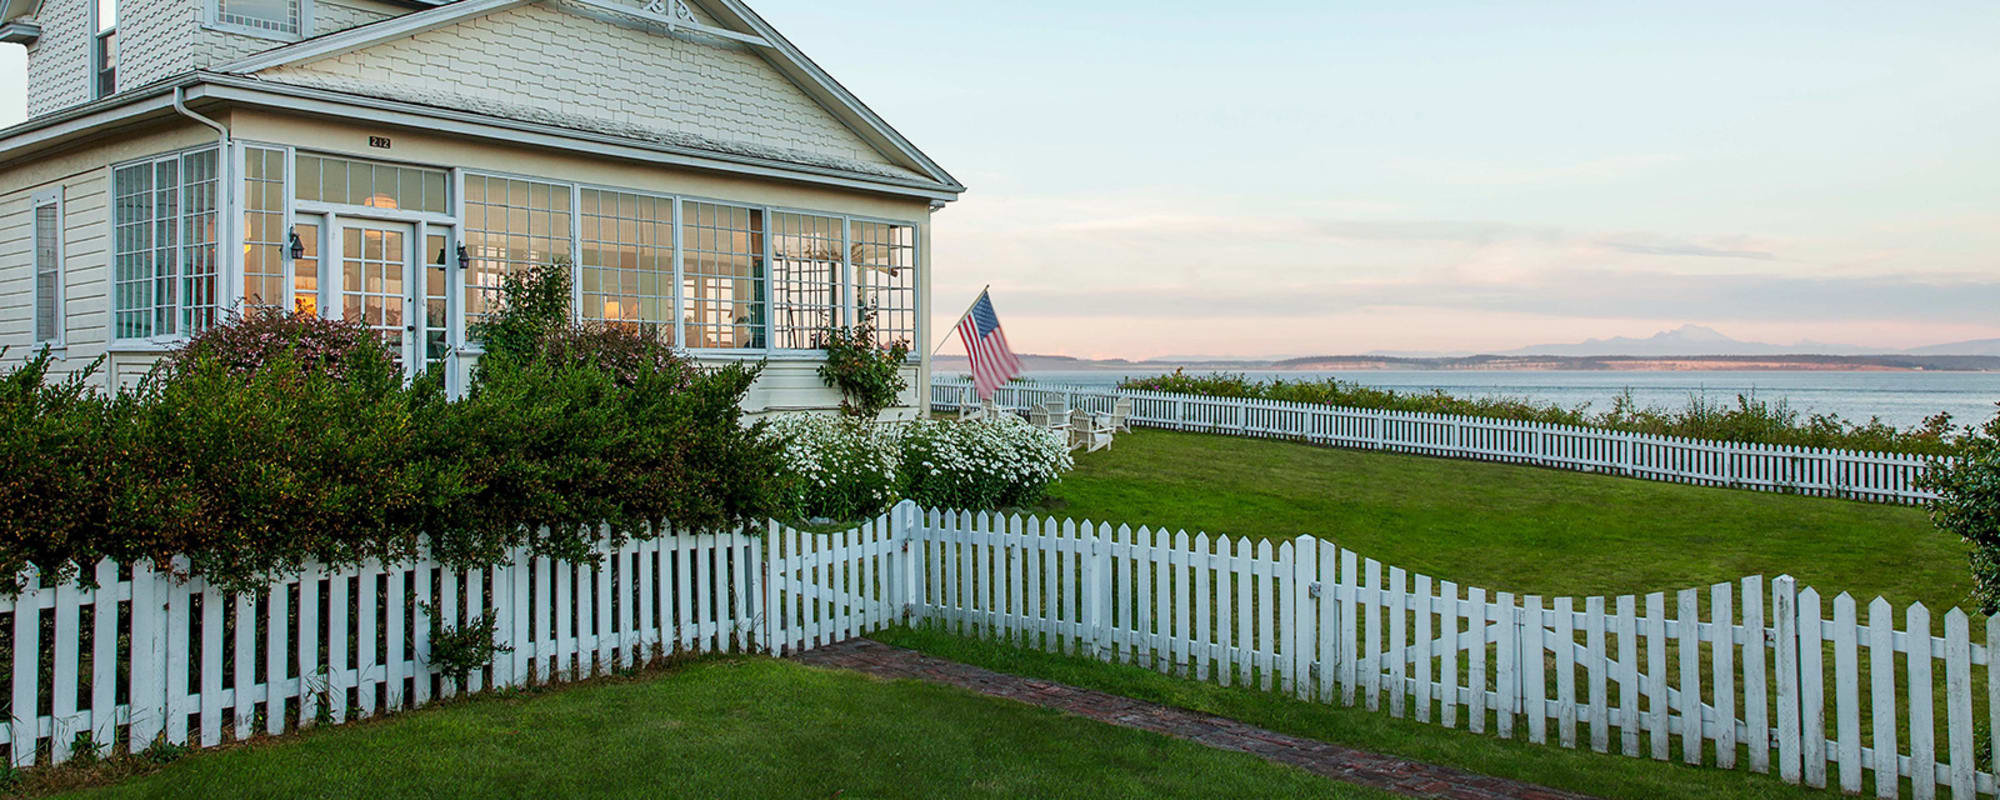 Markham Roberts, James Sansum, Puget Sound, Homestory